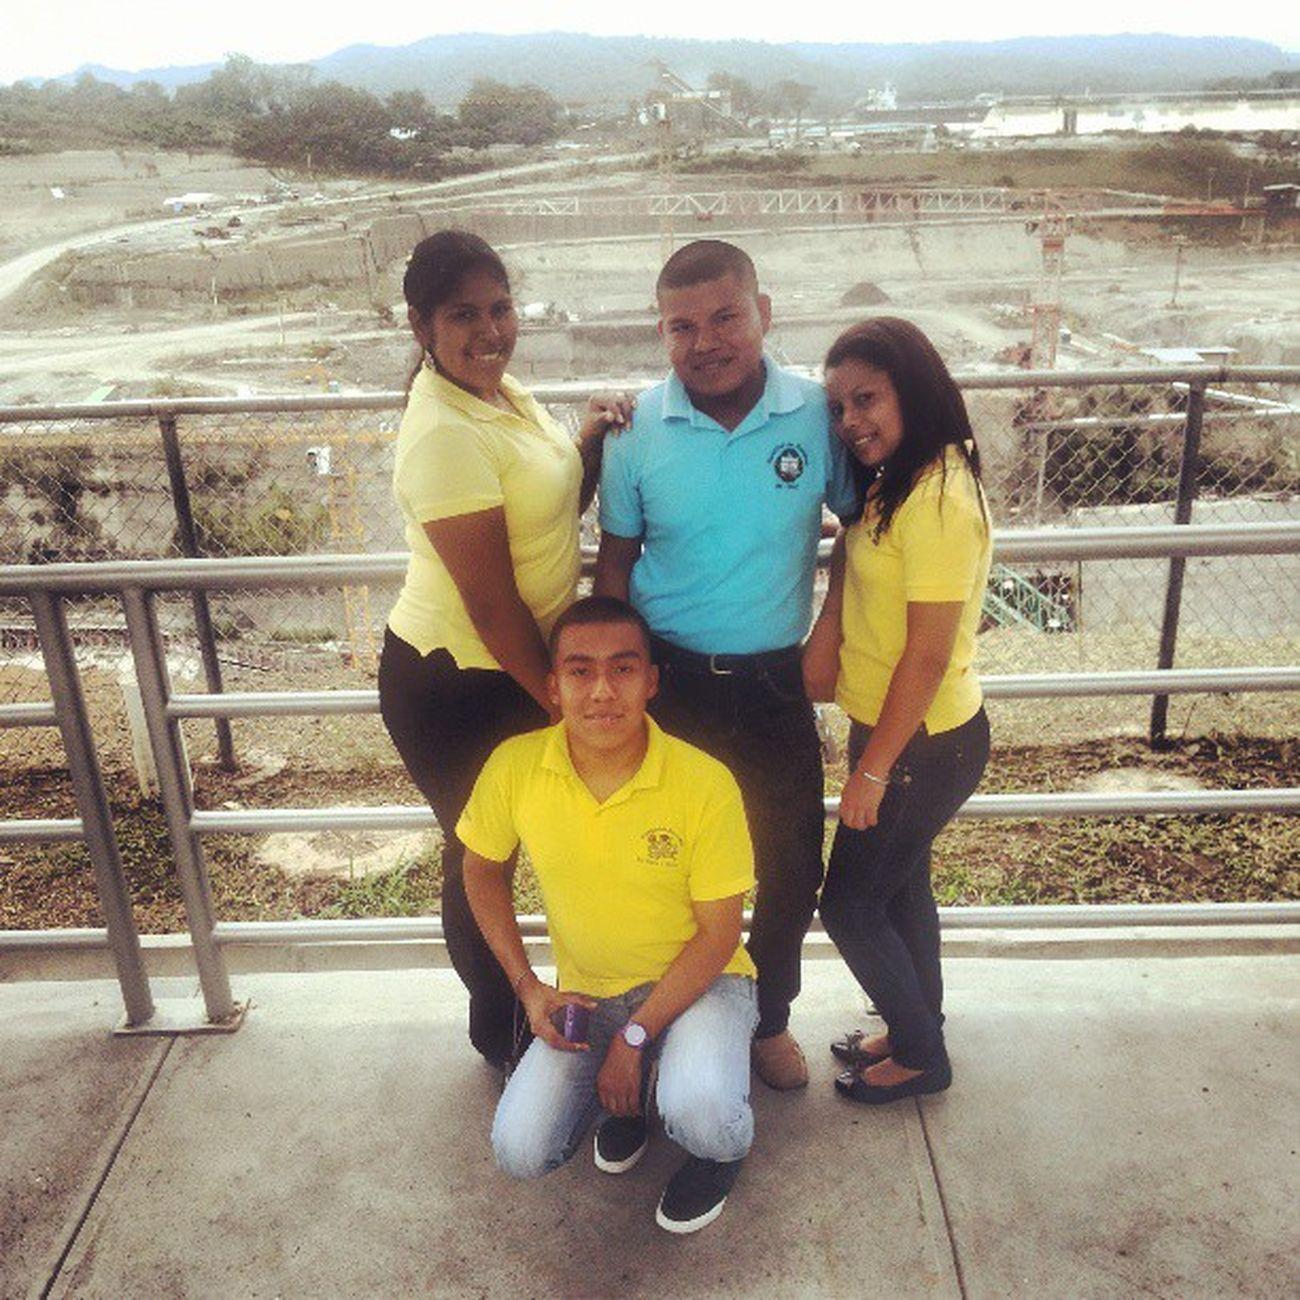 Friends EnElAtlantico CentroDeObservacionDeLaAmpliacion Colon C3 Wonderful Amazing PanamaCanal @canaldepanama GiraAcademica EconomySchool